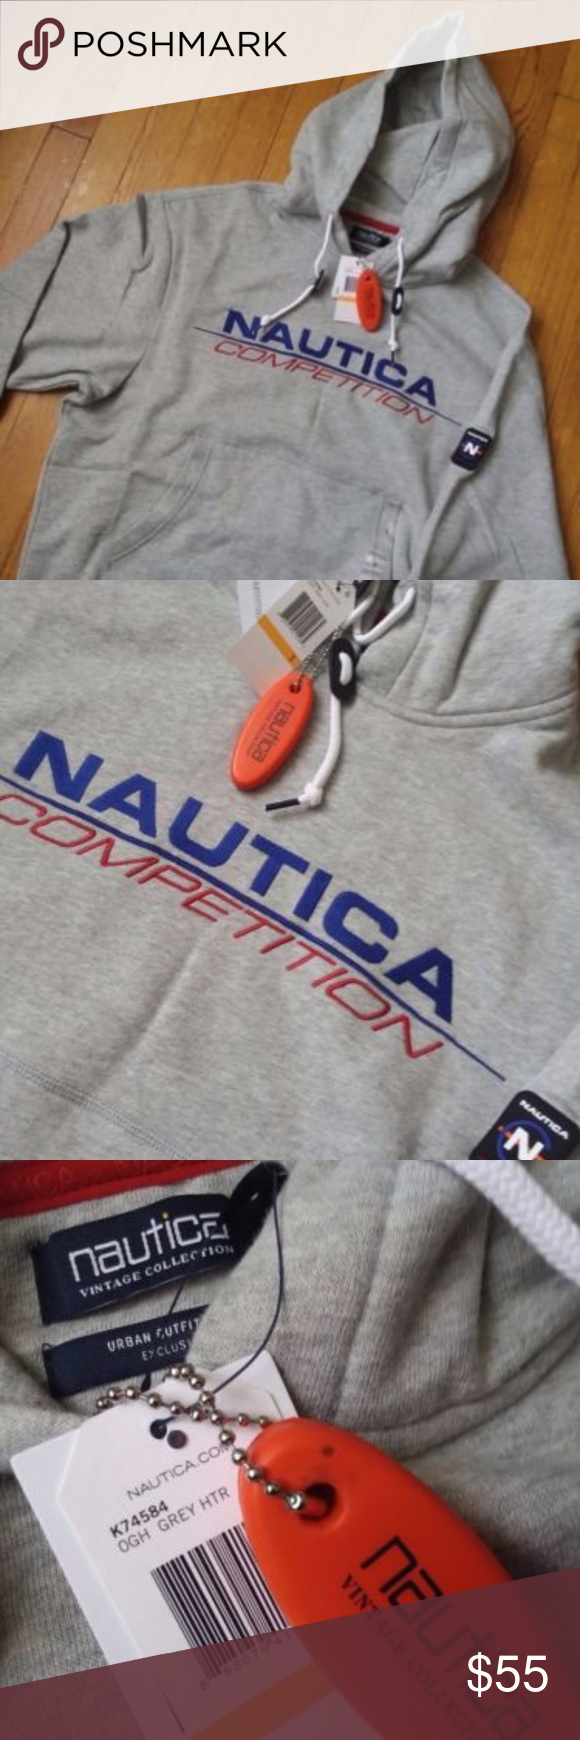 Nwt Nautica Competition Vintage Collection Hoodie Hoodies Sweatshirt Shirt Hoodies Men